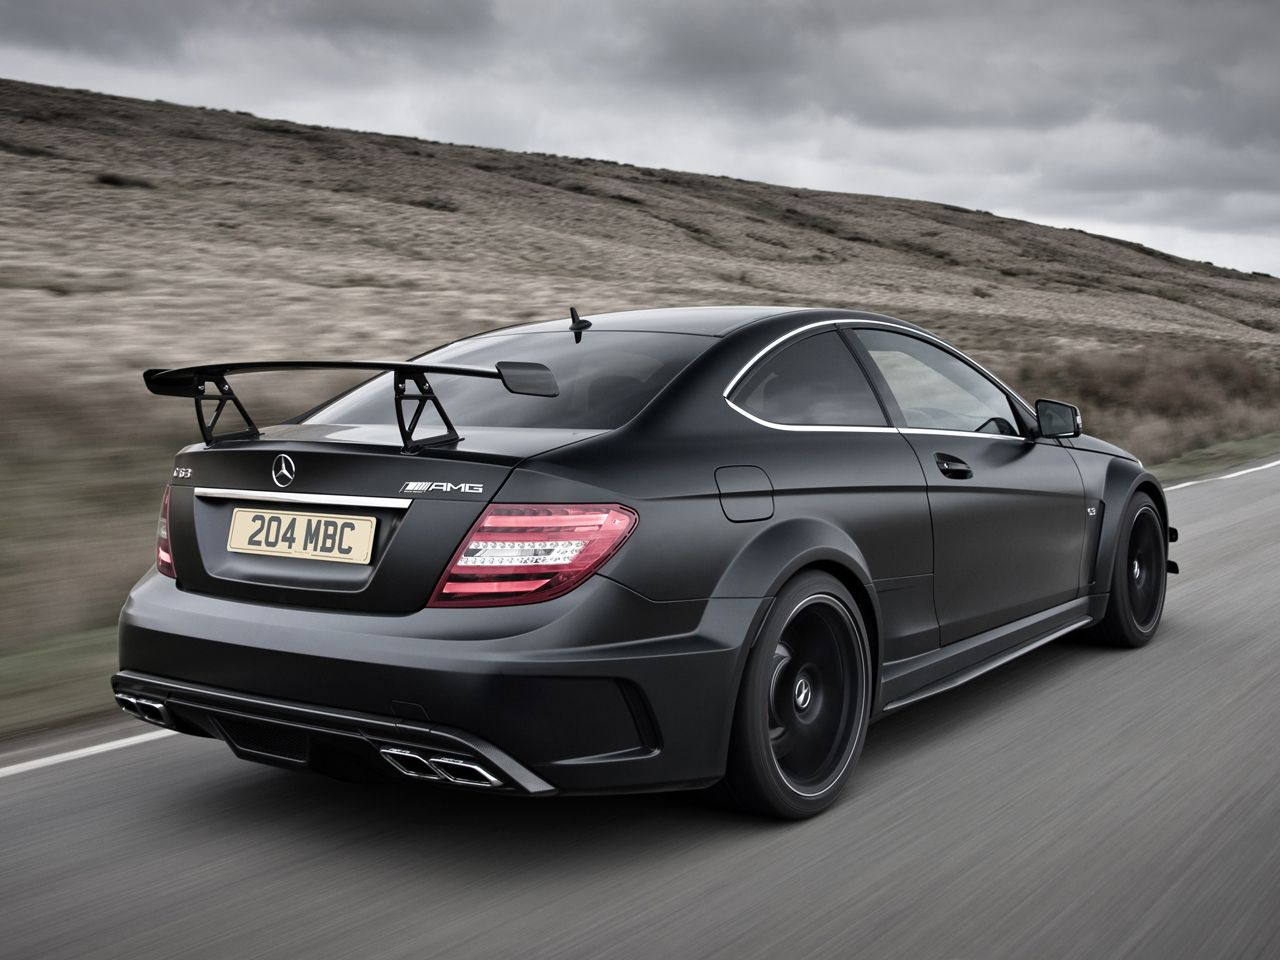 C63 Amg Black Series >> C63 Amg Black Series Mercedes Benz C63 Amg Mercedes Amg Benz